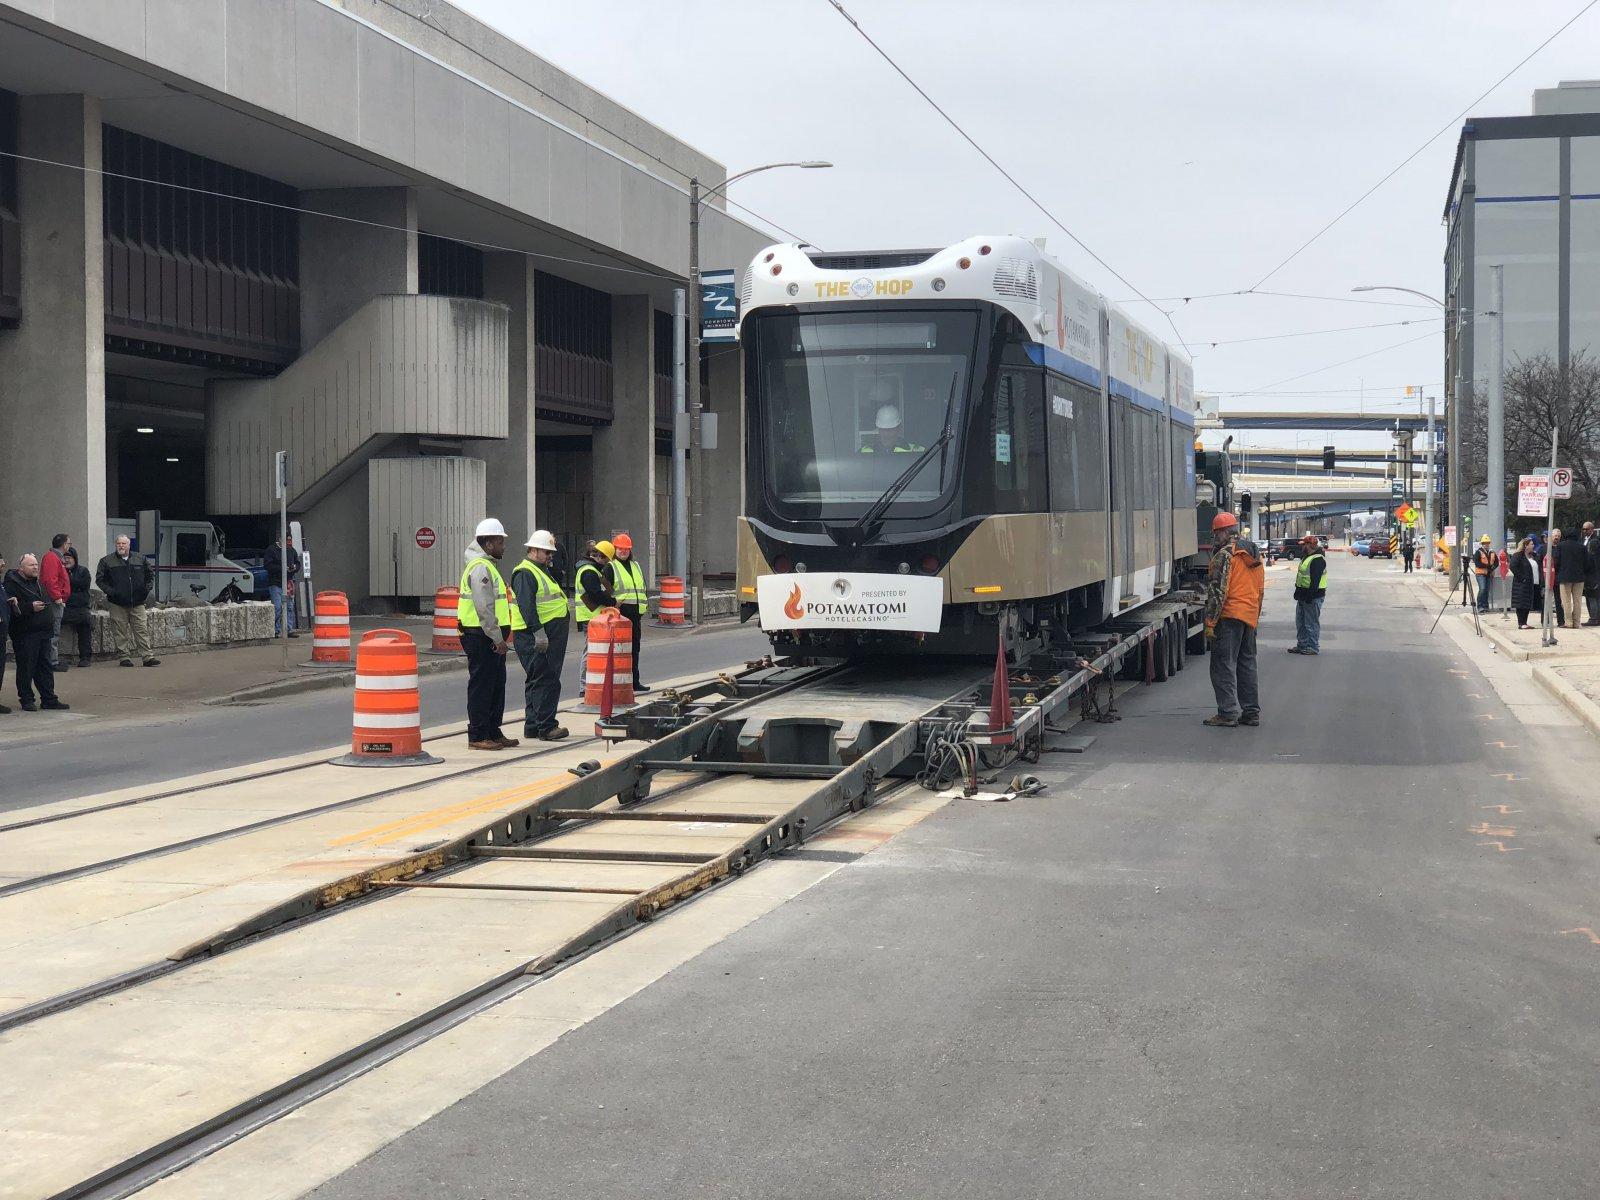 Streetcar Arrival